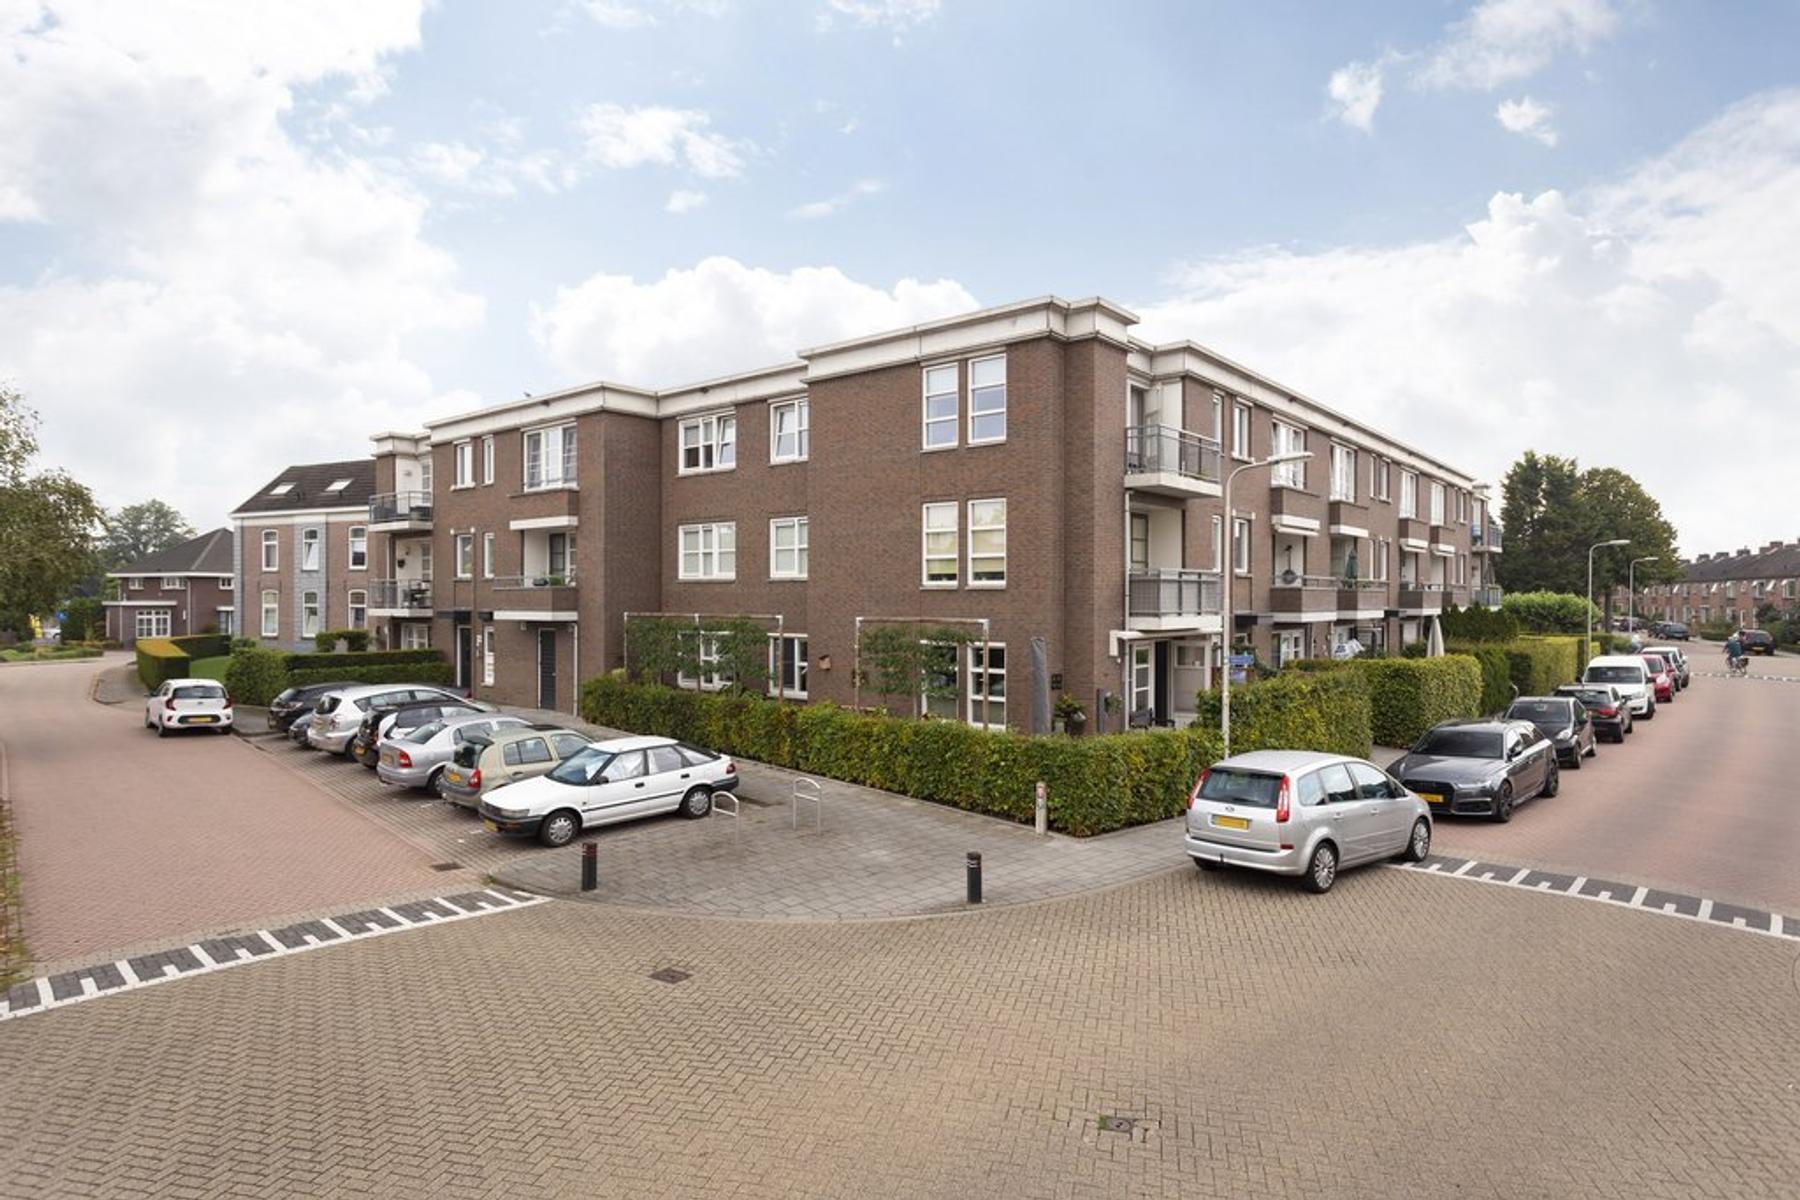 Klappenburgstraat 3 M in Bemmel 6681 XN